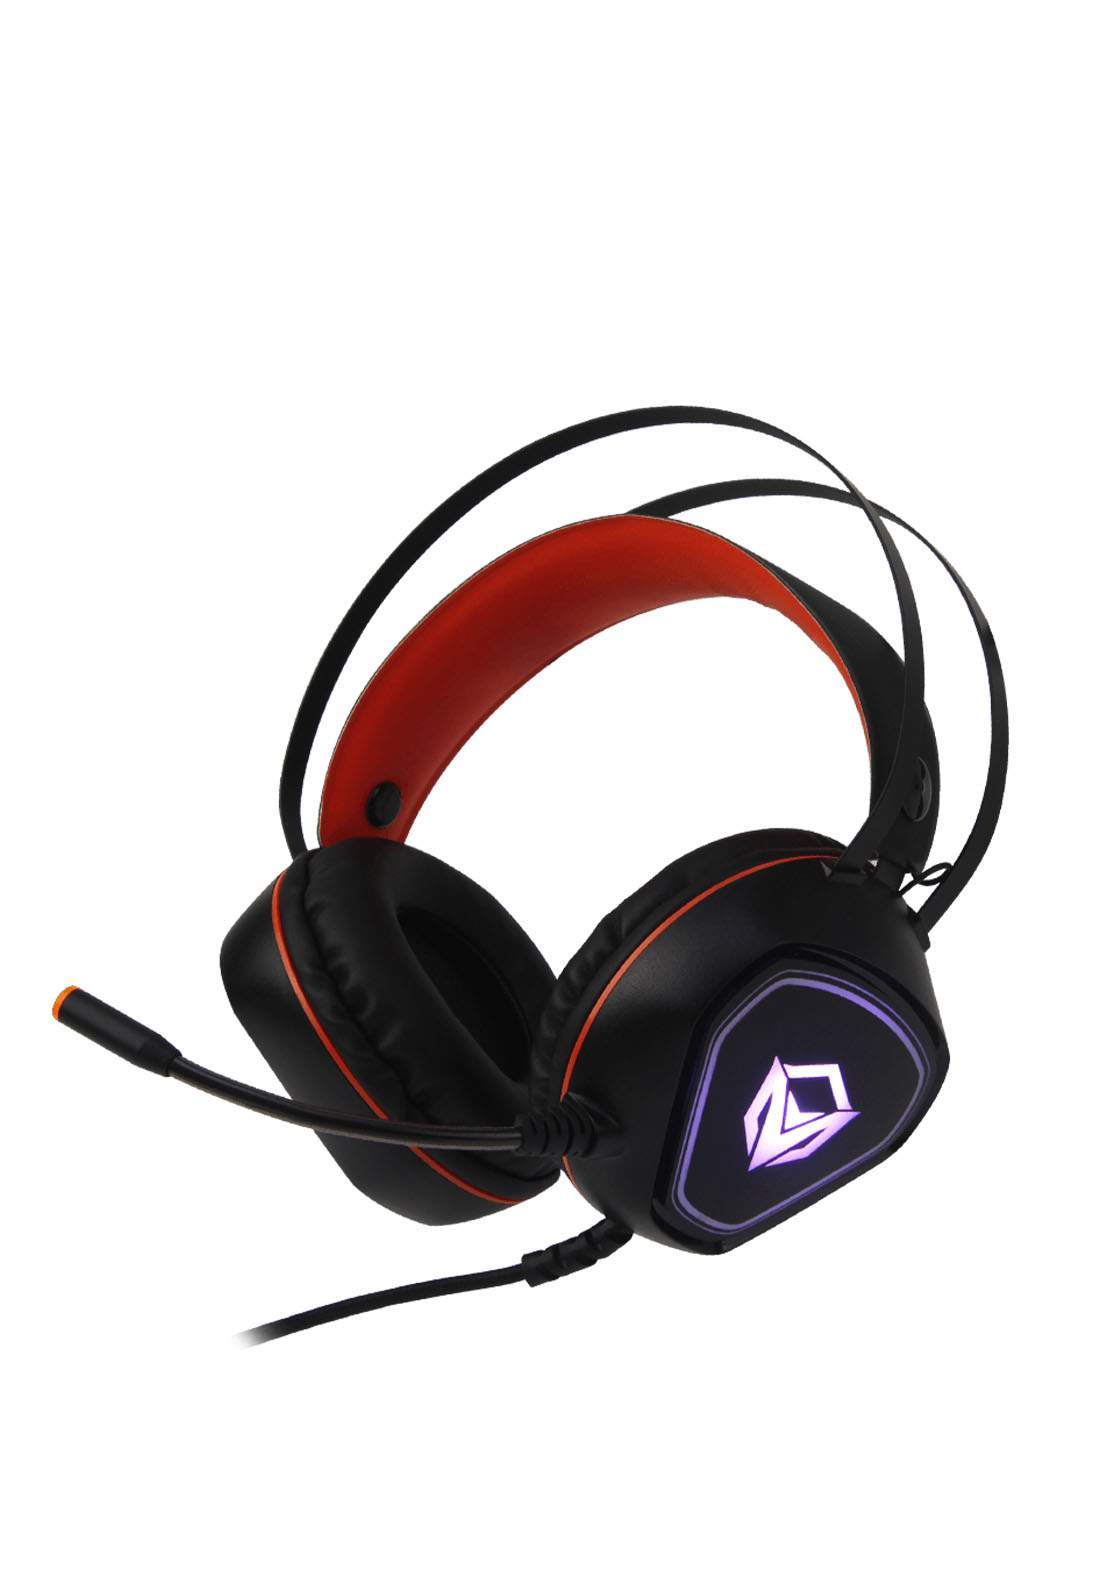 Meetion HP020 Wired Gaming Headset - Black سماعة سلكية